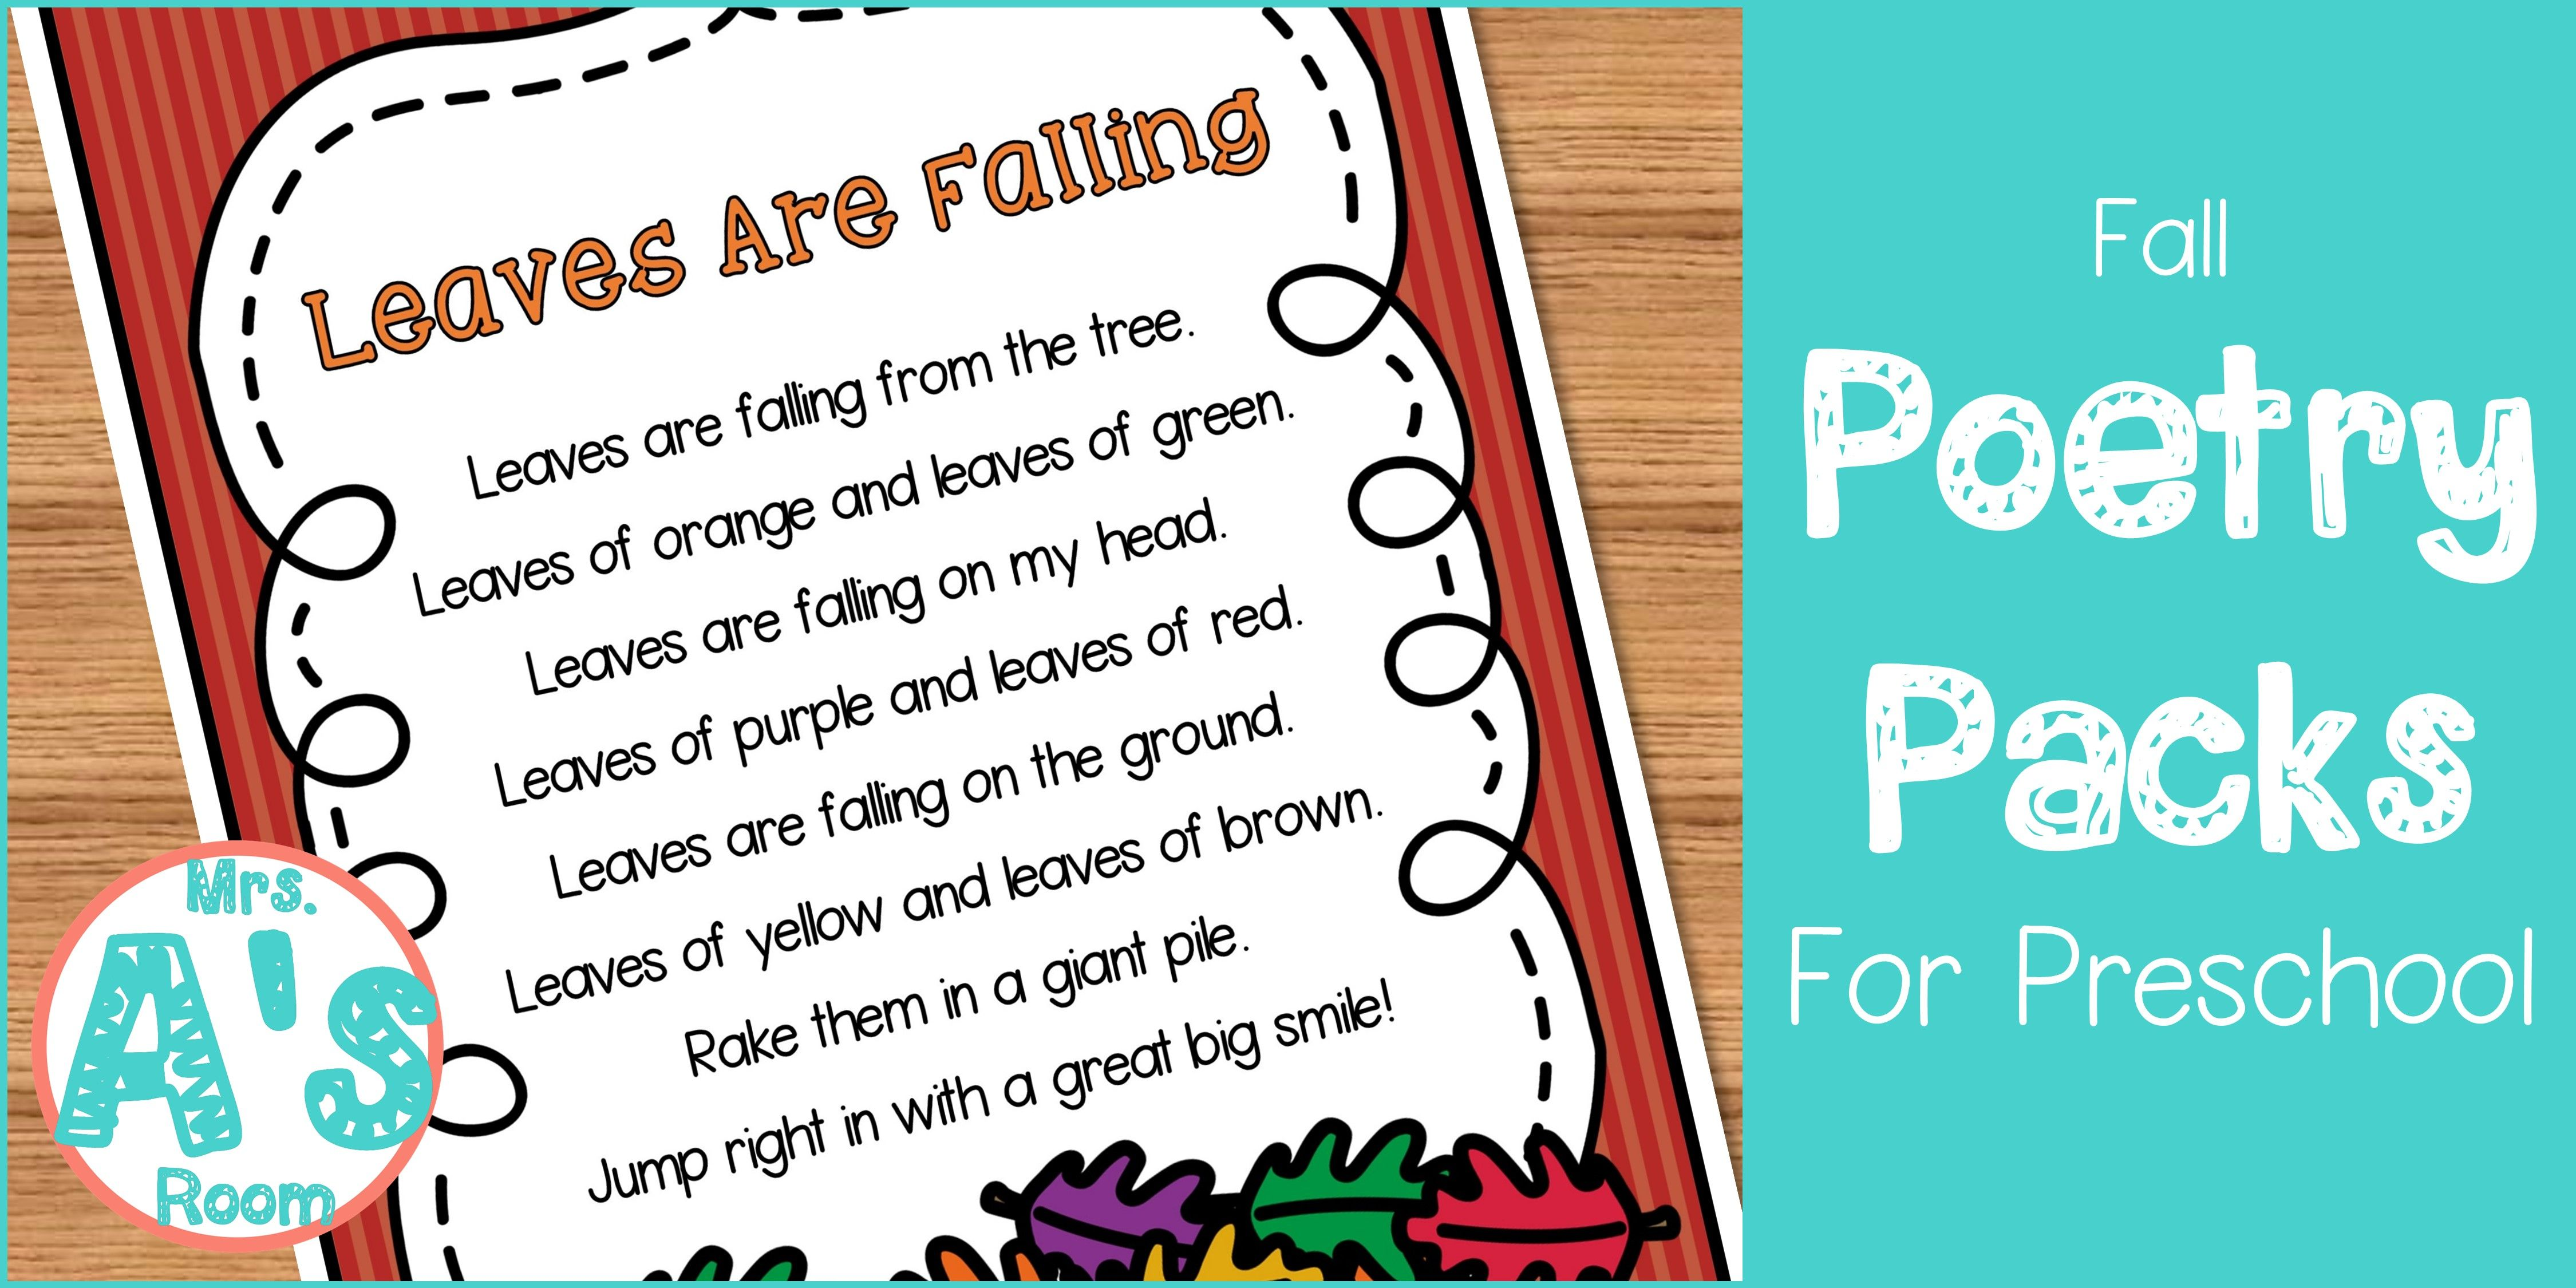 Fall Poems For Preschool